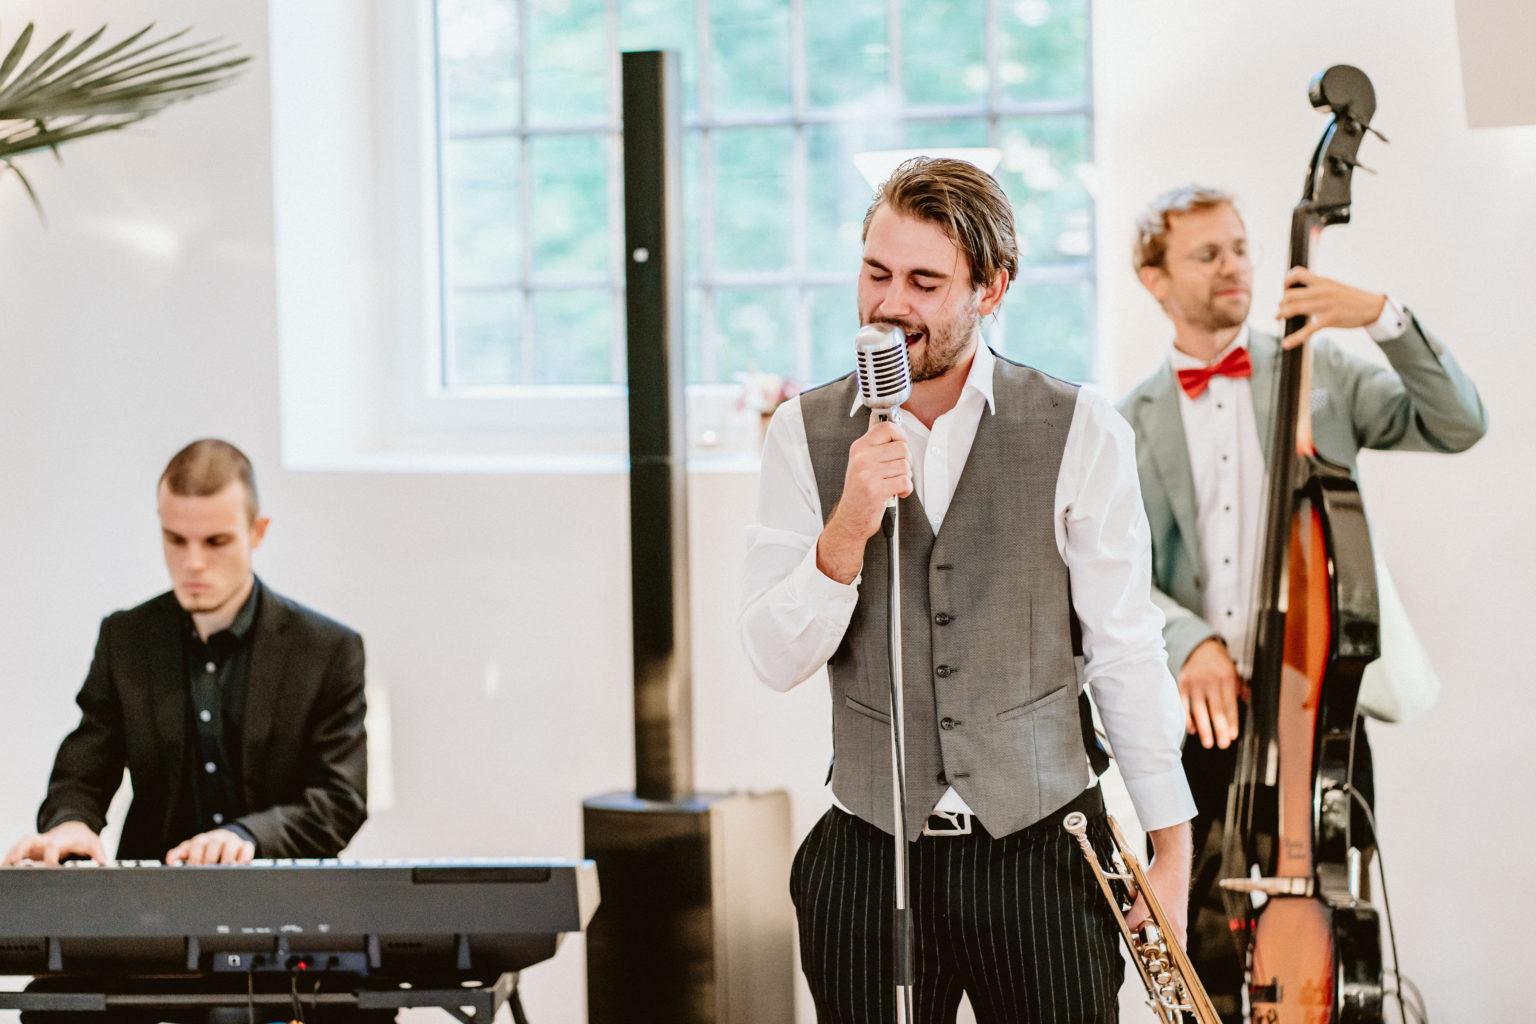 Hochzeitsband 2020 - All Jazz Ambassadors _2